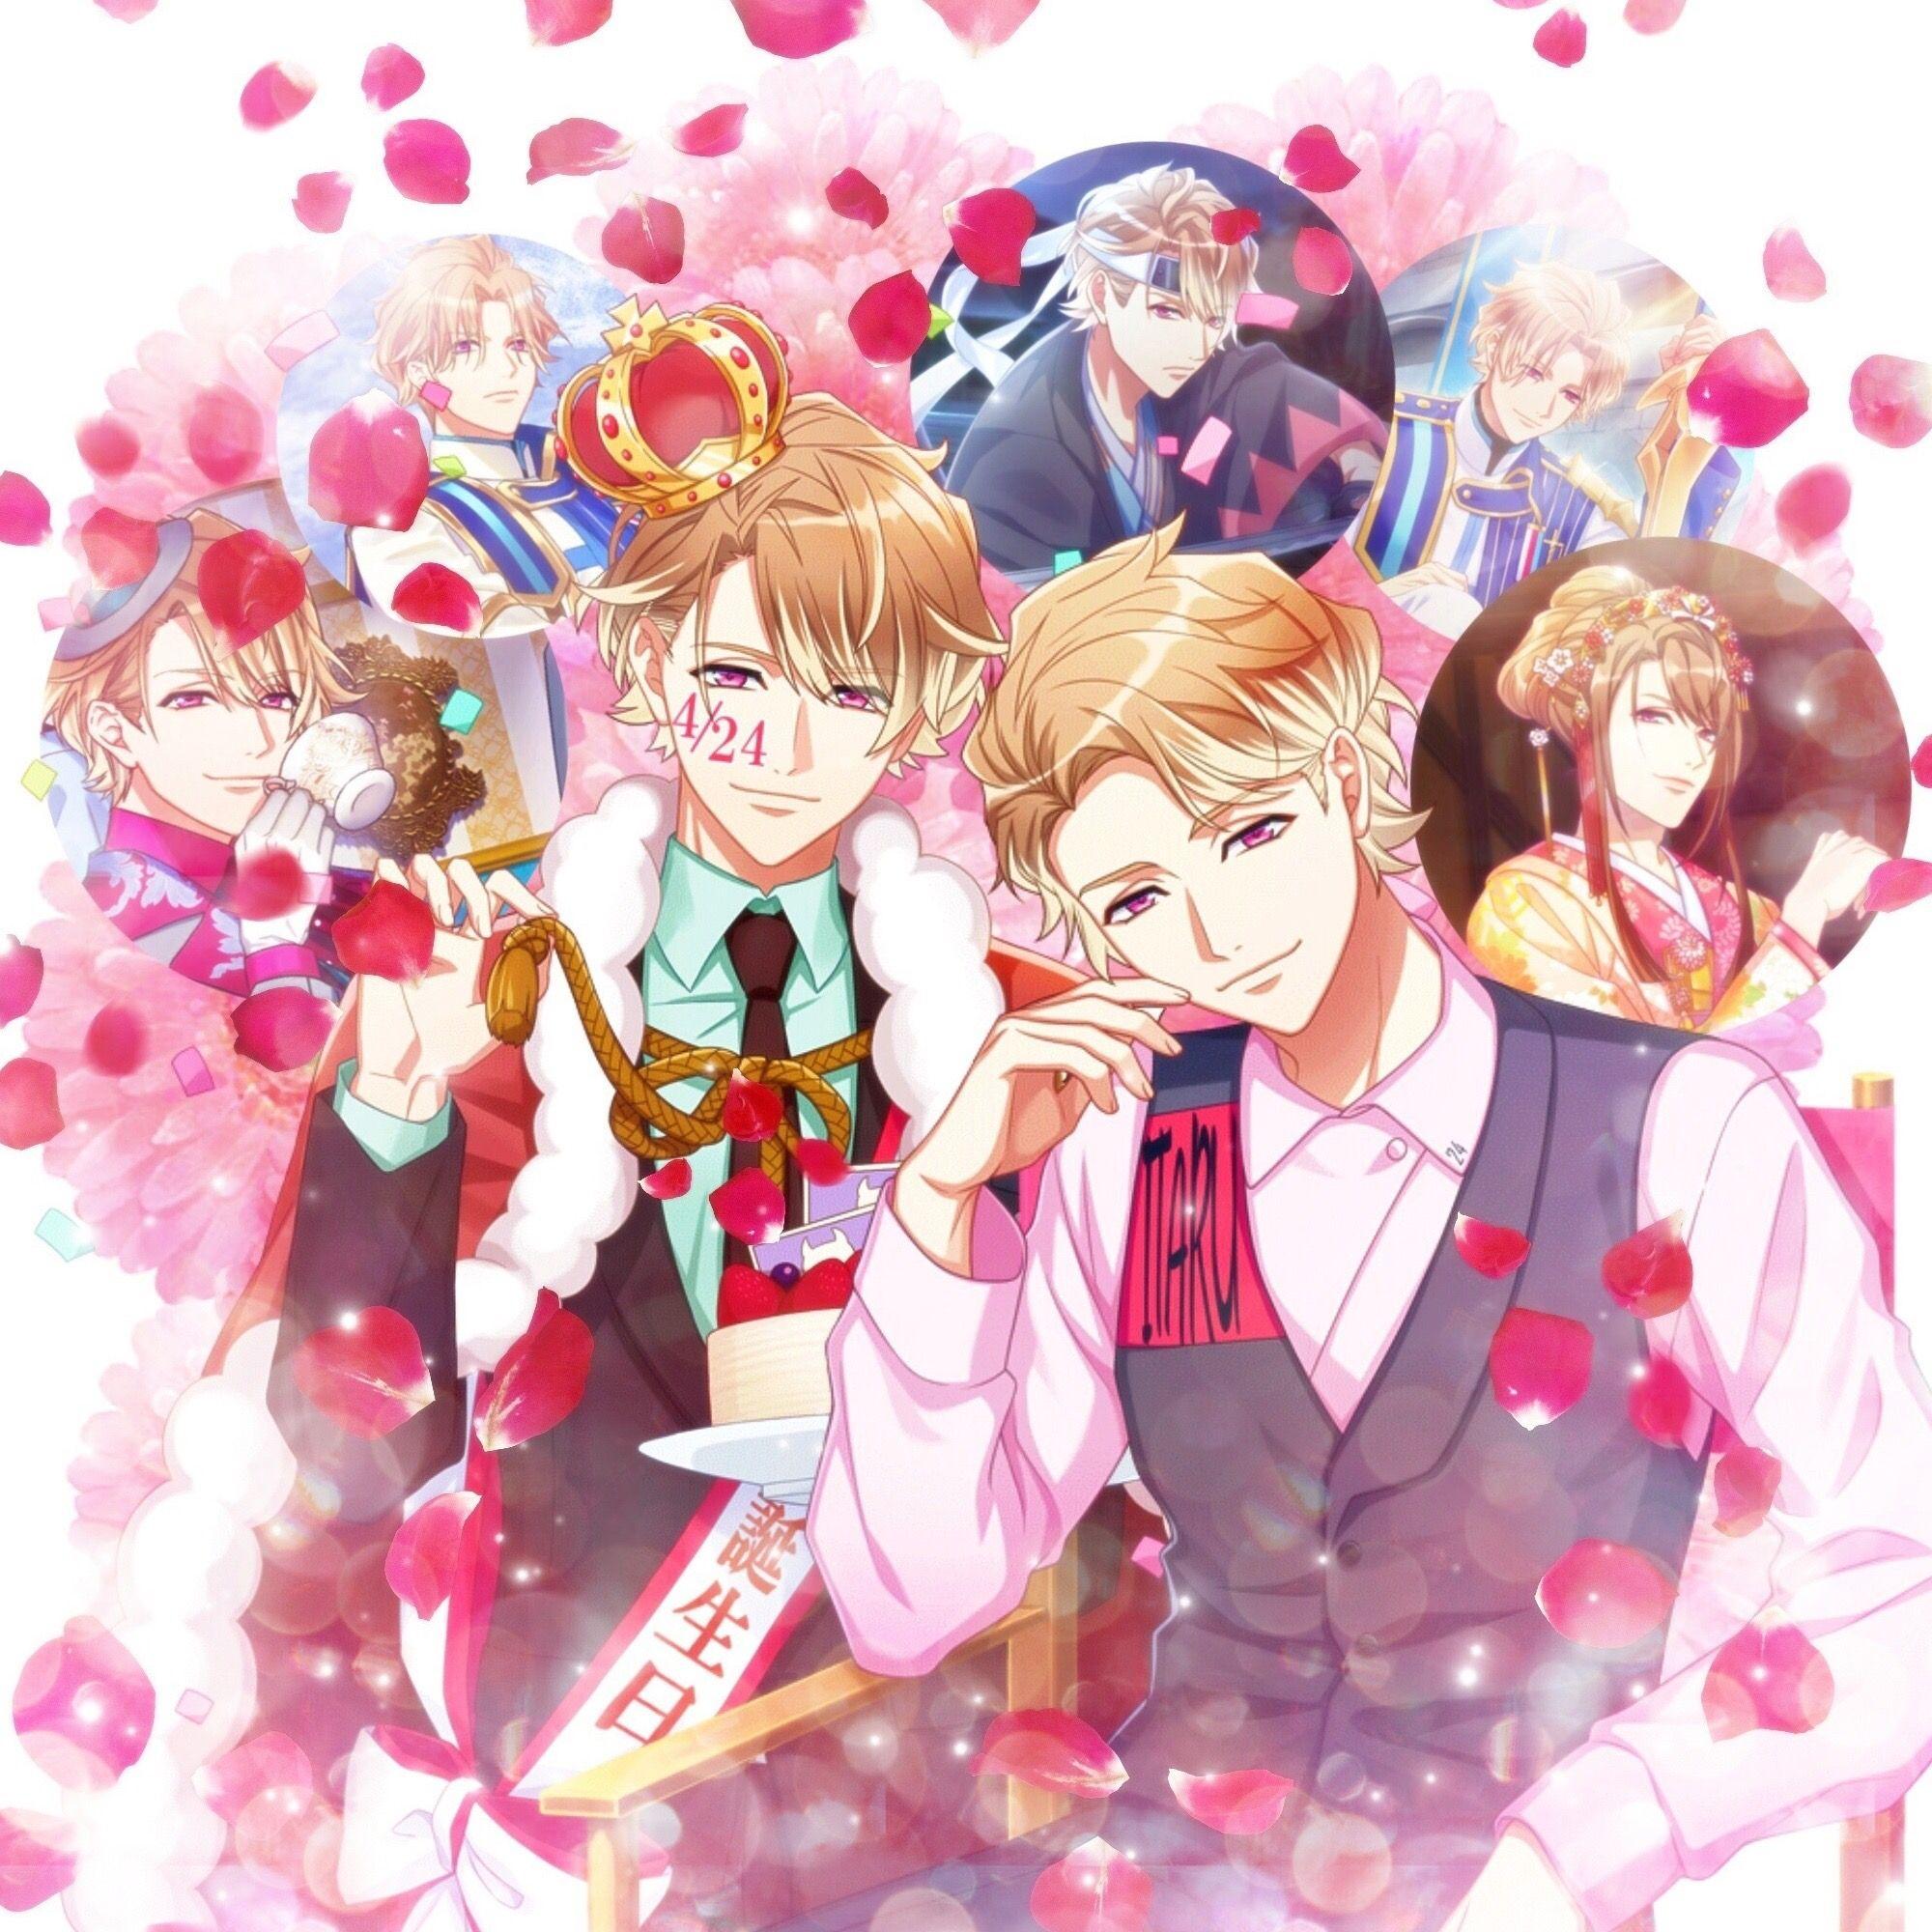 HAPPY BIRTHDAY 茅ヶ崎至 in 2020 Anime, Anime boy, Happy birthday